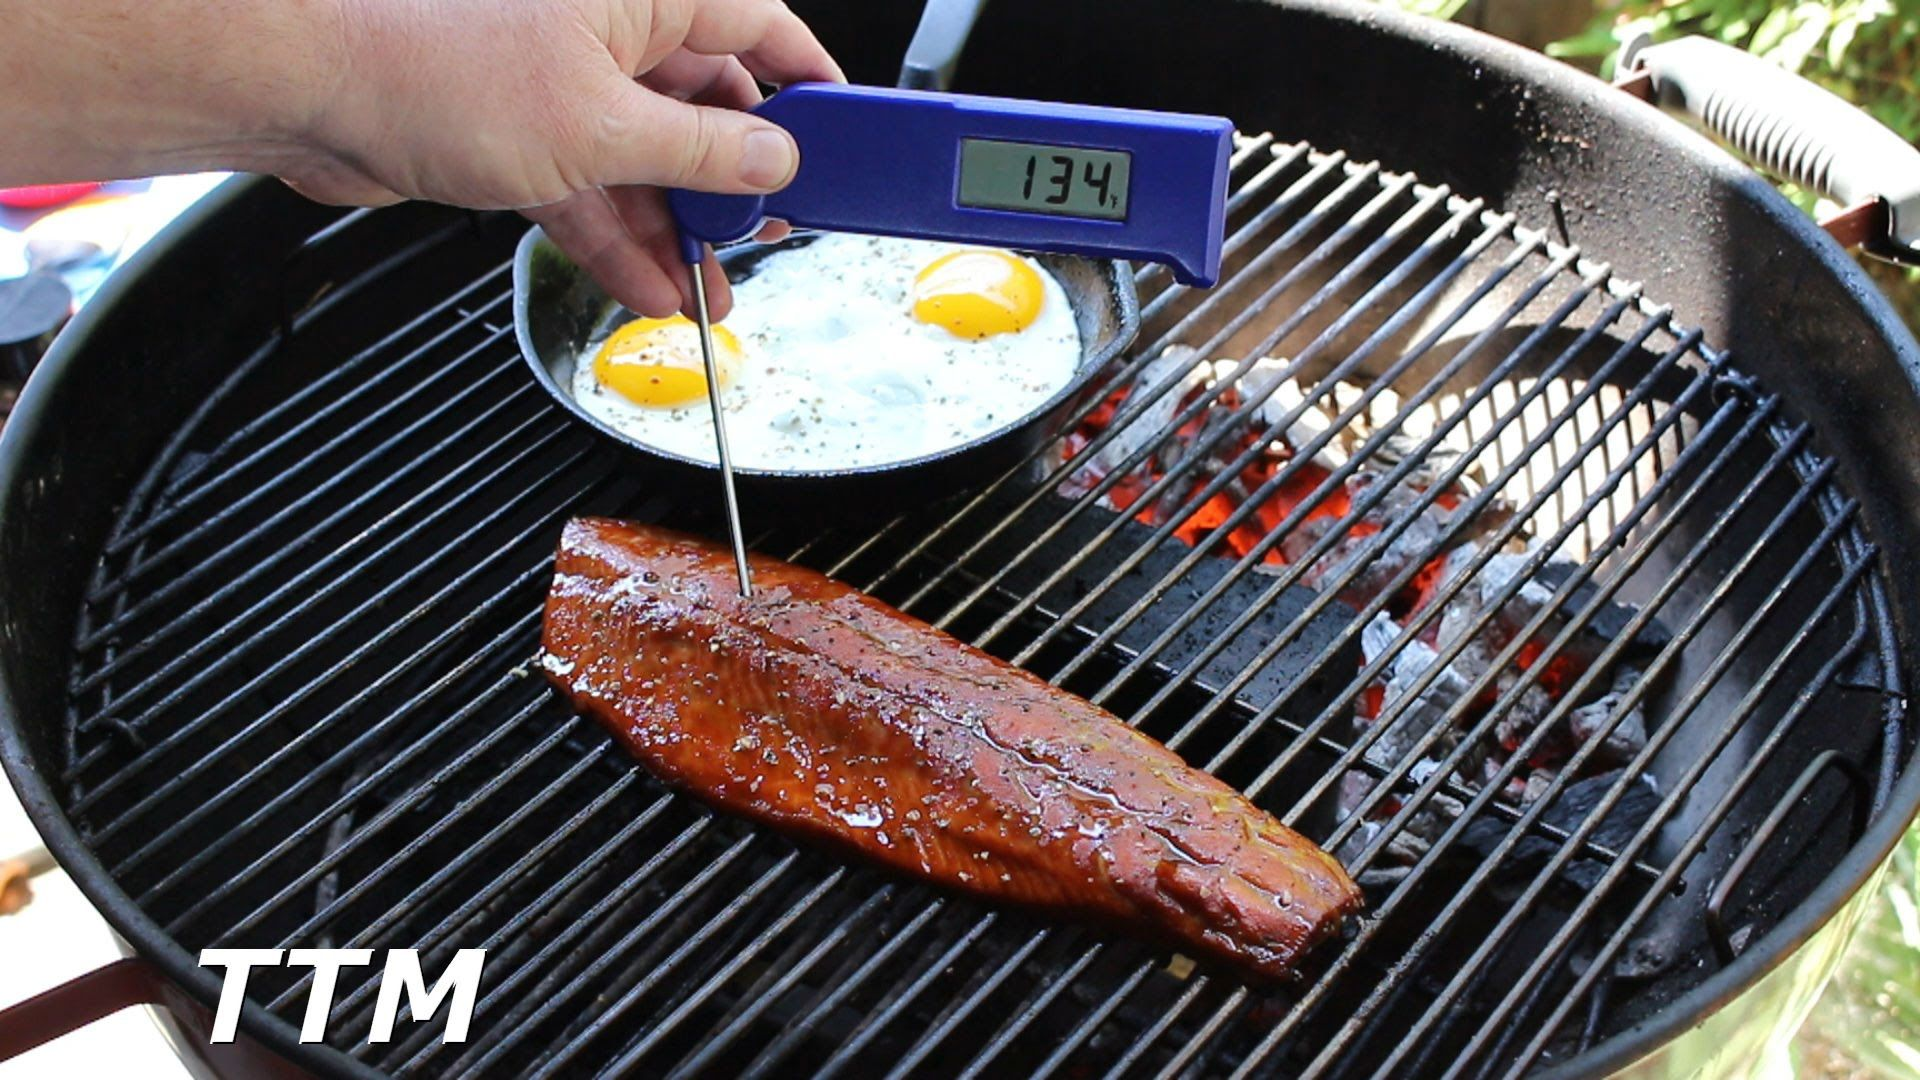 How To Cook Teriyaki Salmon On The Weber Kettle Grill Salmon And Eggs Cooking Salmon Teriyaki Salmon Weber Kettle